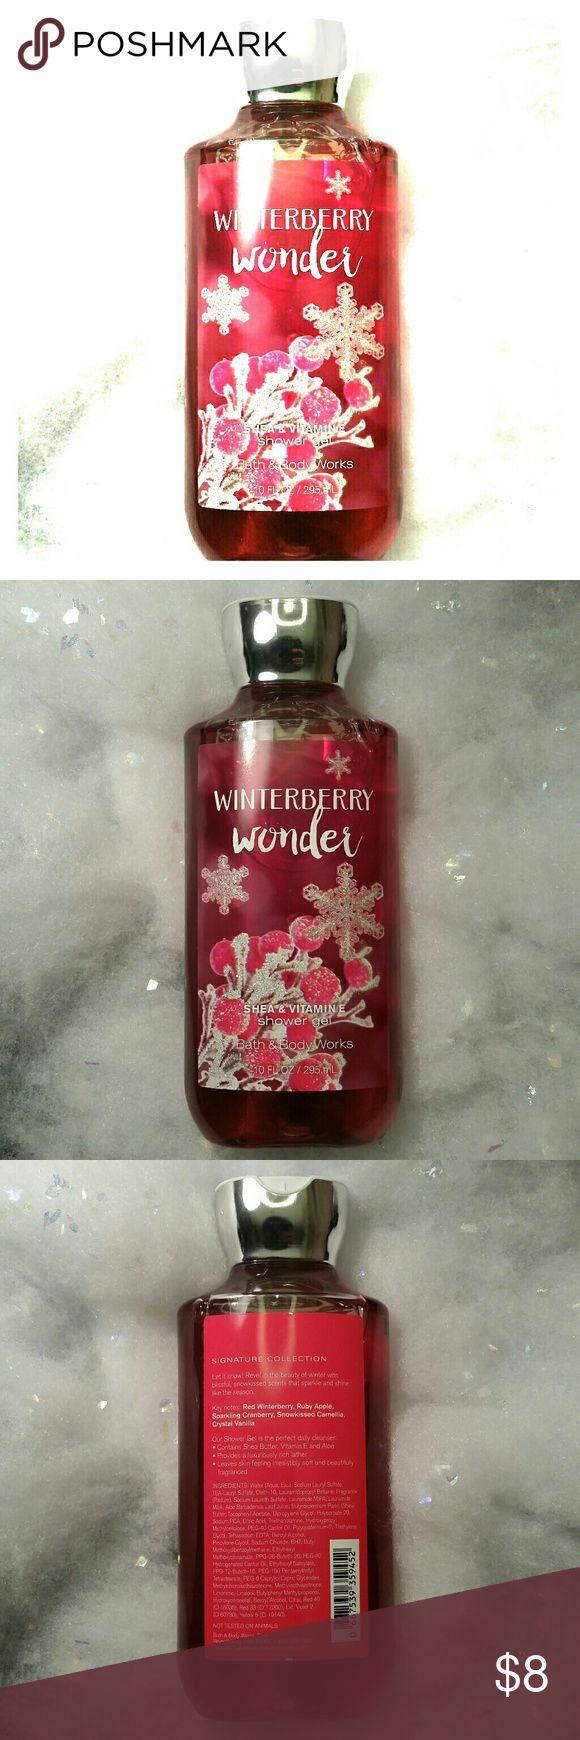 NWT BBW ❄️ Shower Gel ❄️ winterberry wonder NWT 10oz / 295ml Bath & Body Works winterberry wonder shea & Vitamin E shower gel. Never used. Bath & Body Works Other